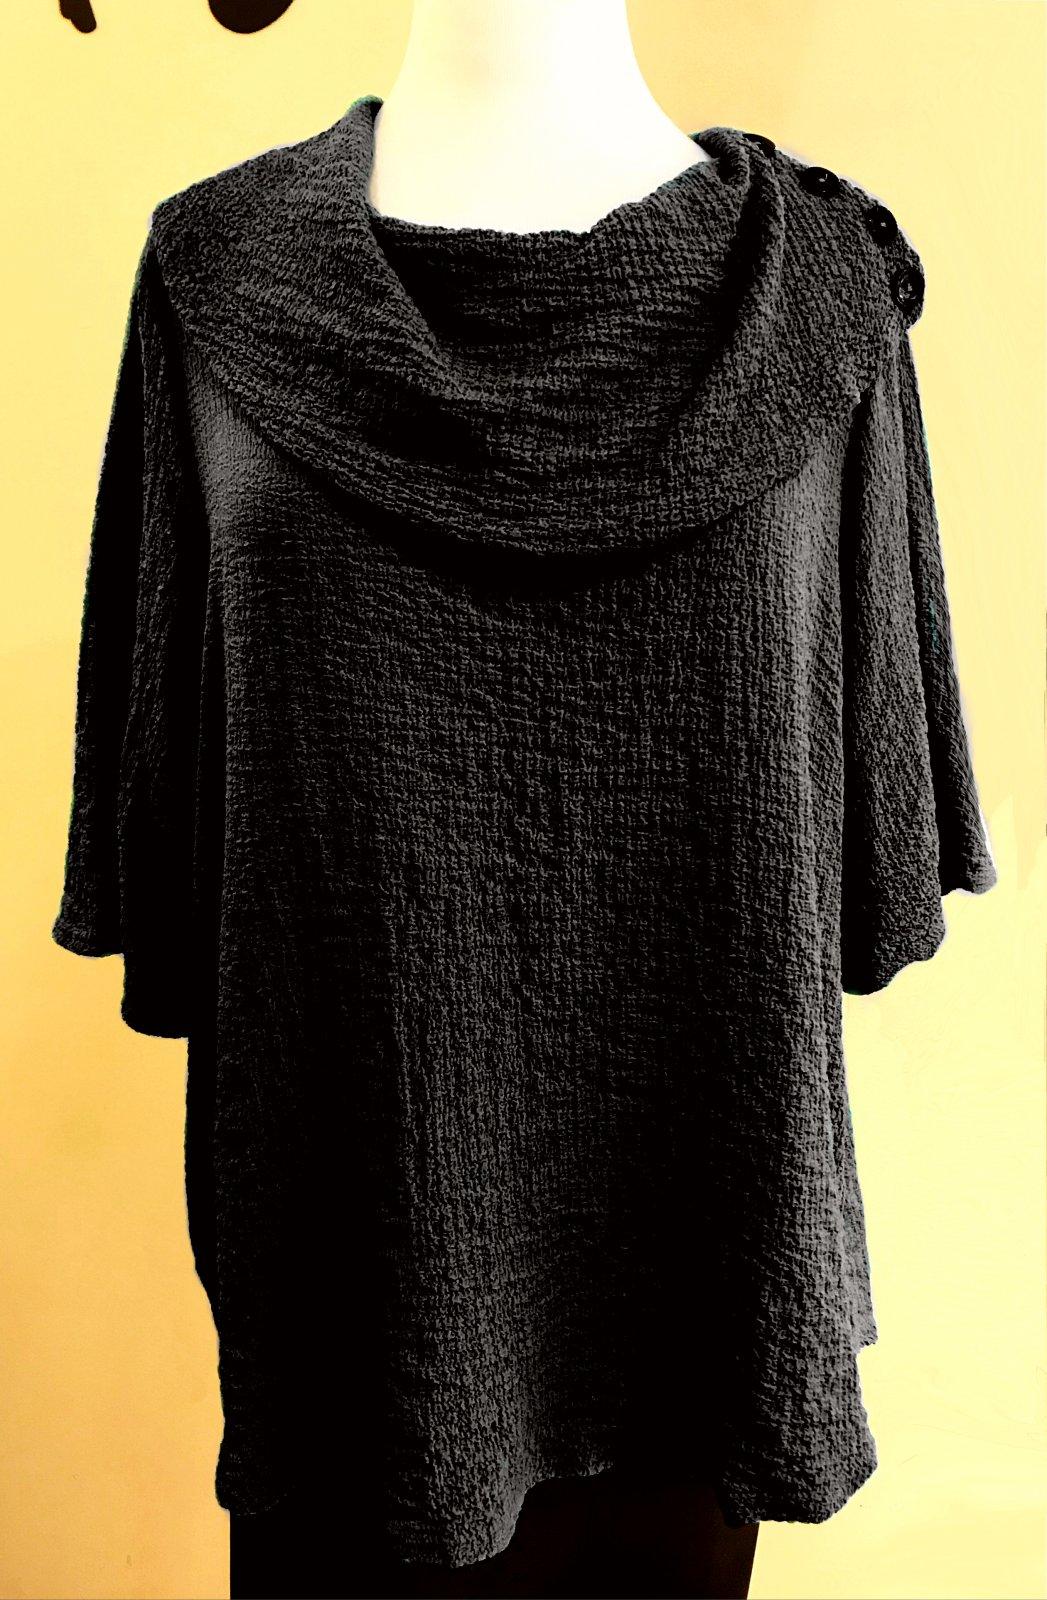 Yushi Top - Black